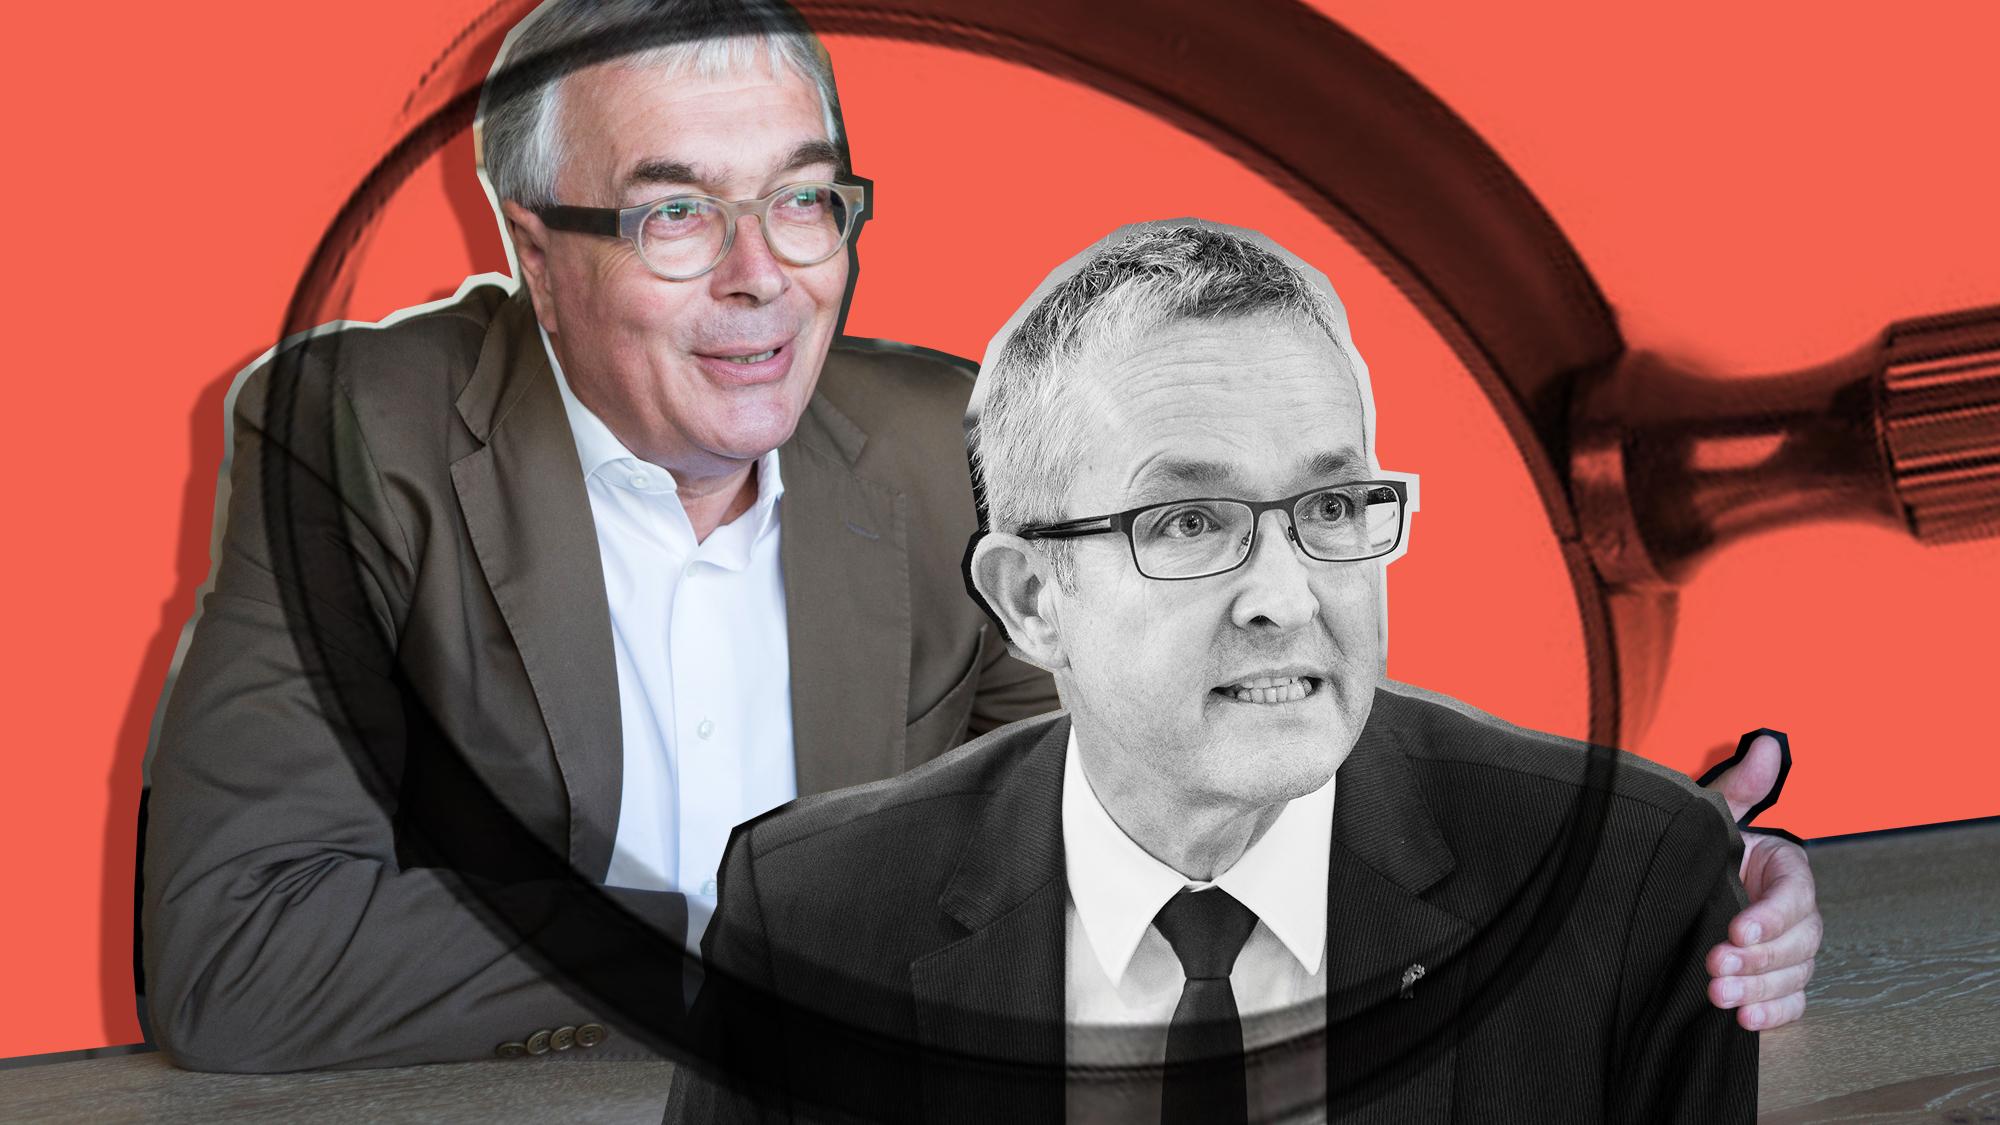 Unerwarteter Beistand: Christoph Bruschtin (SP) verteidigt den Baselbieter Amtskollegen Thomas Weber (SVP).